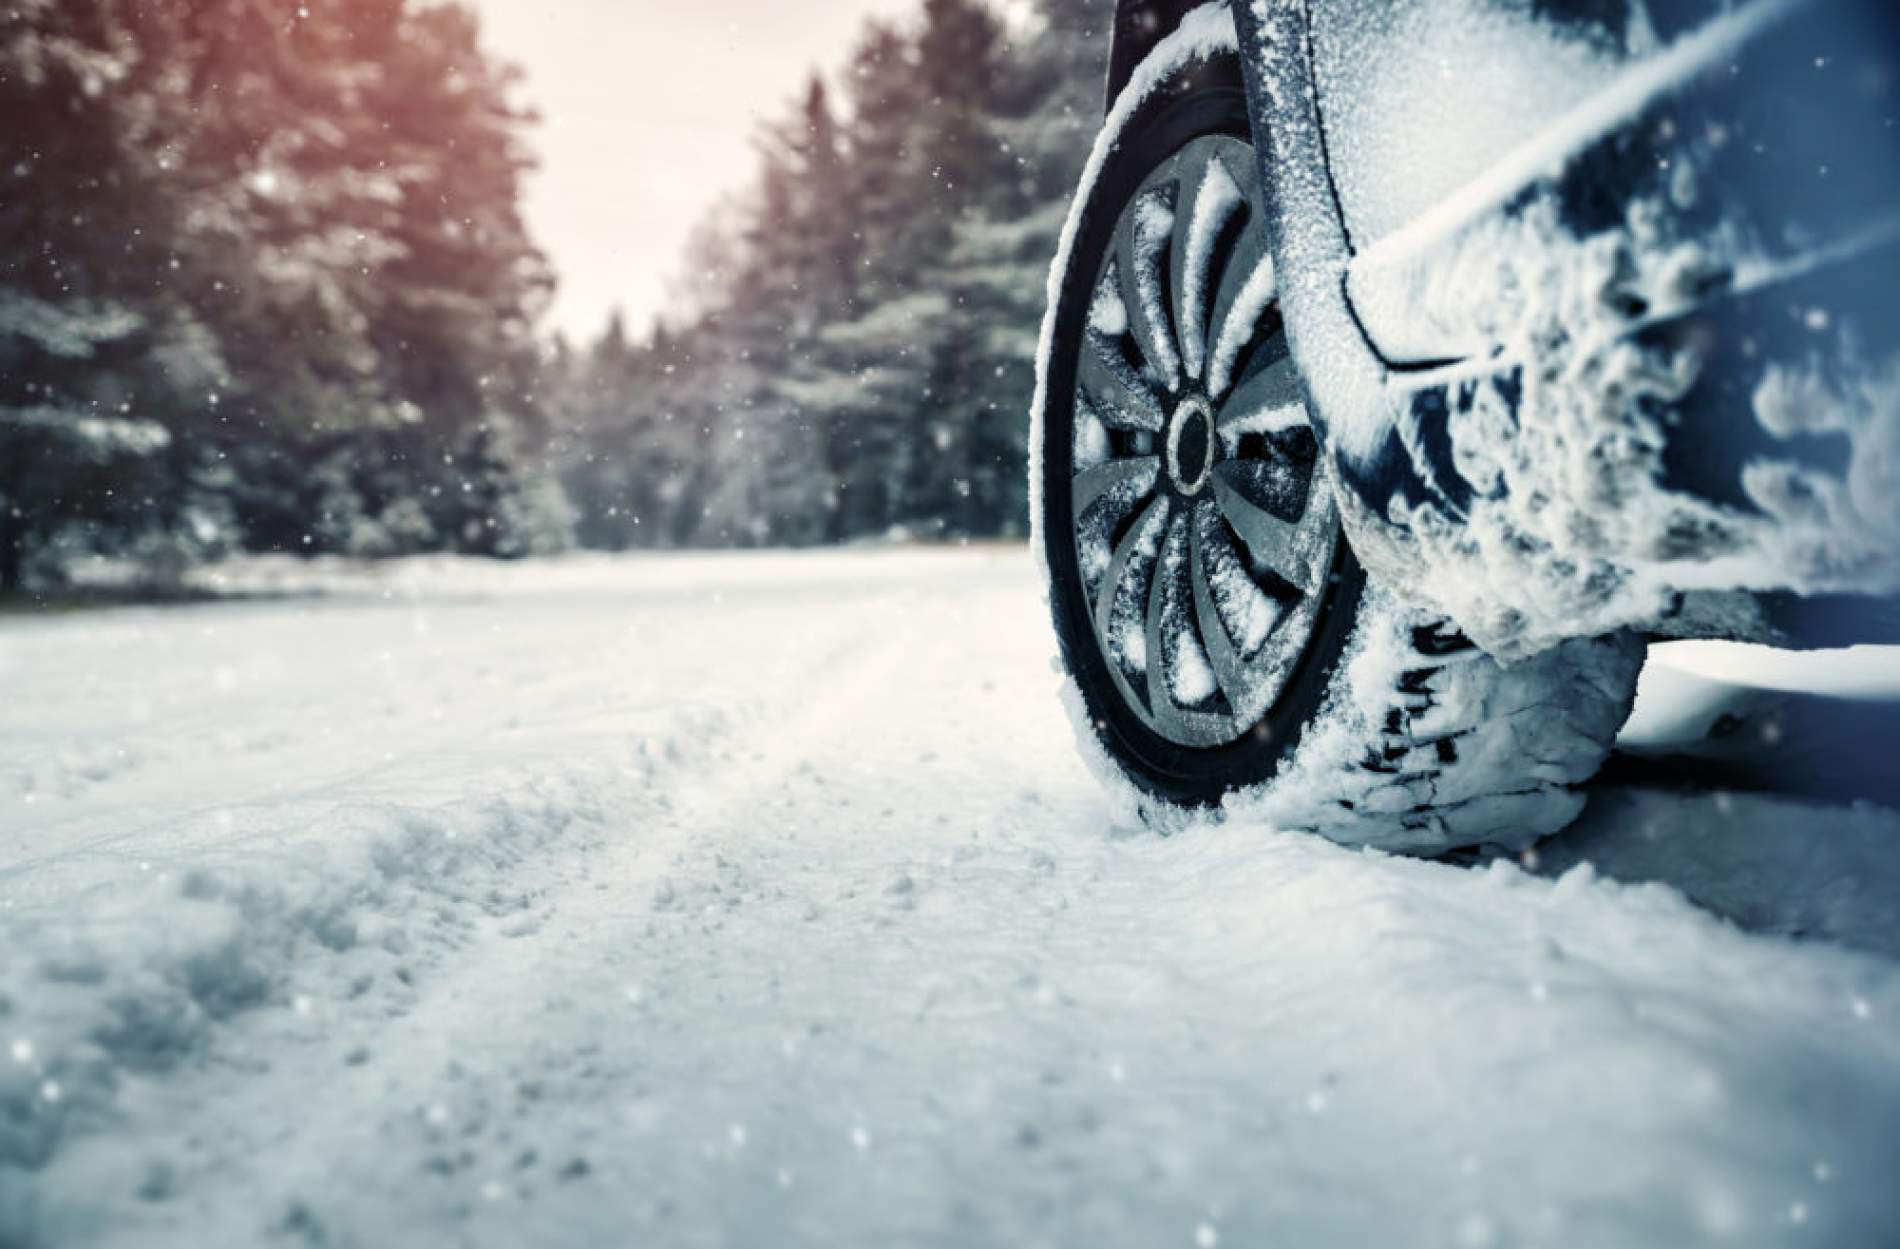 winter driving risks